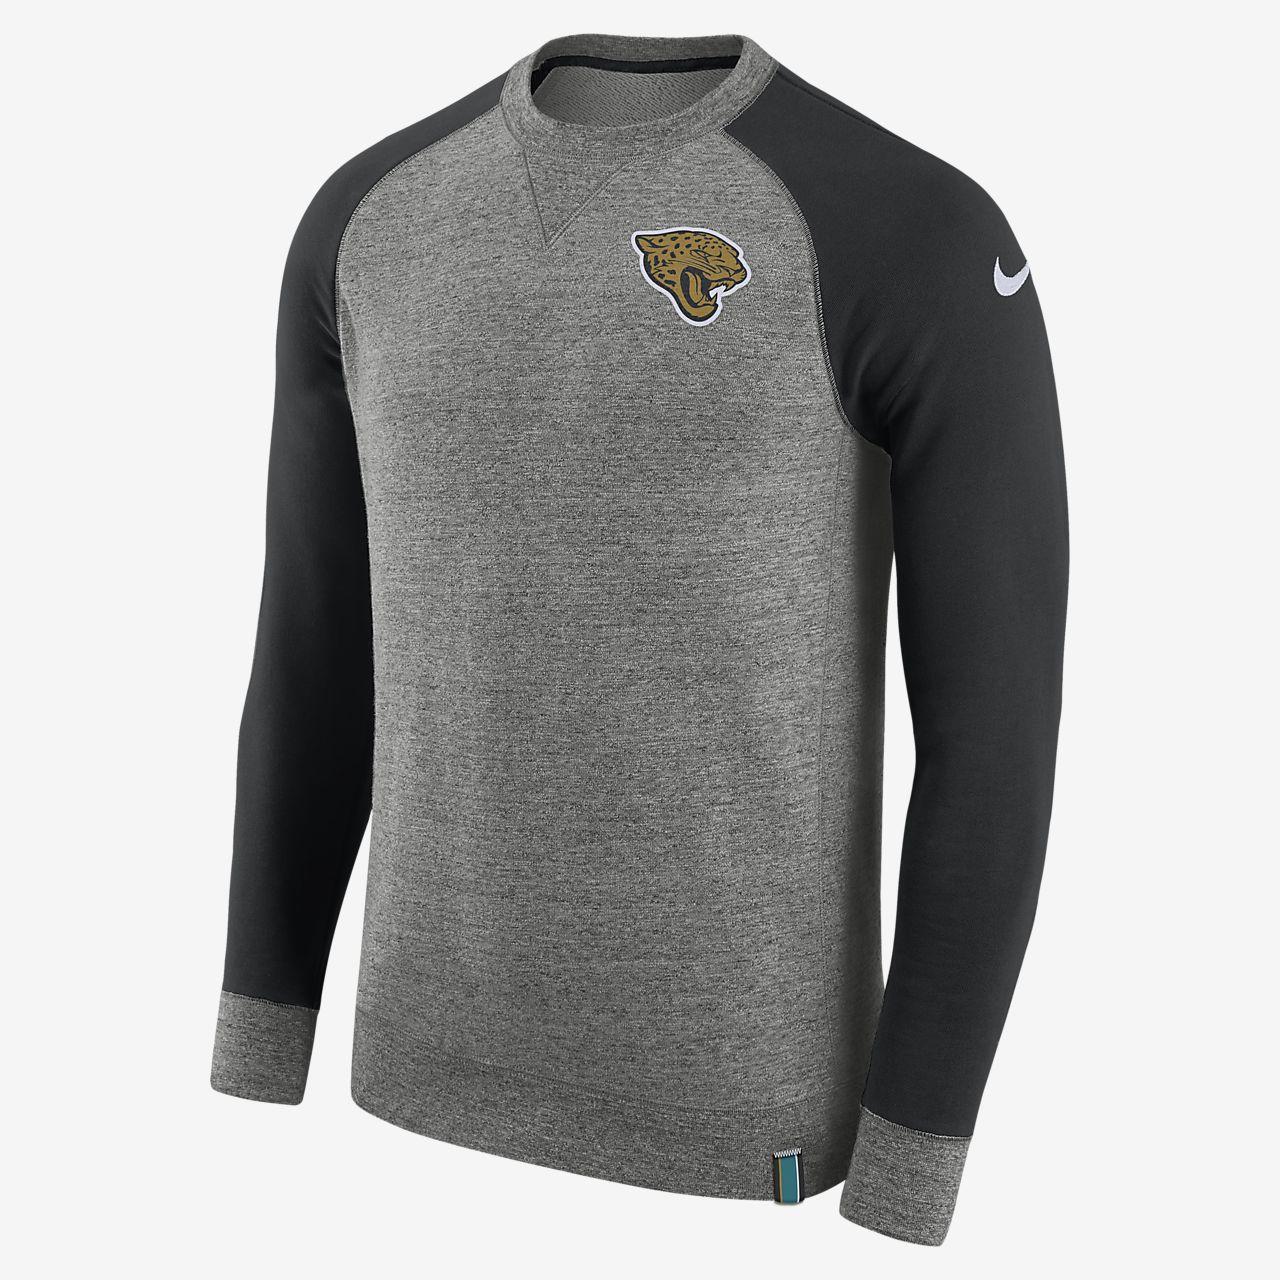 Sudadera para hombre Nike AW77 (NFL Jaguars)